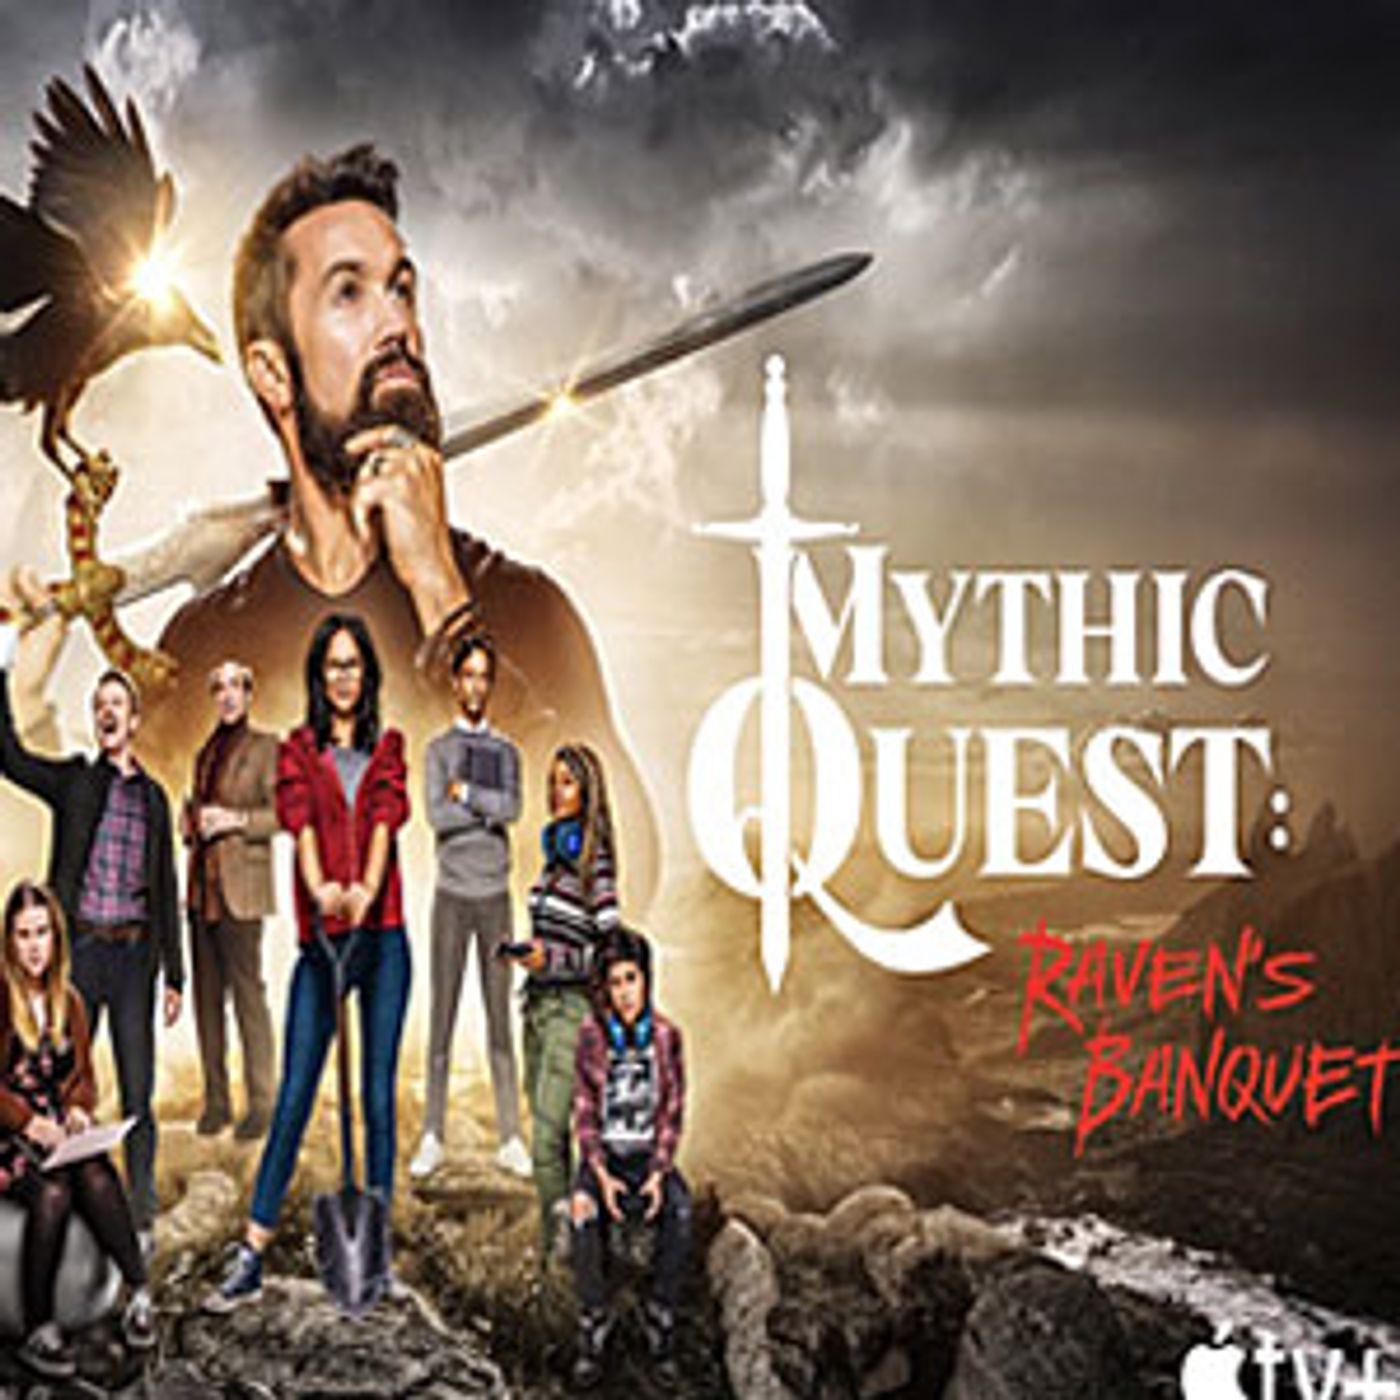 Mythic Quest Ravens Banquet Special